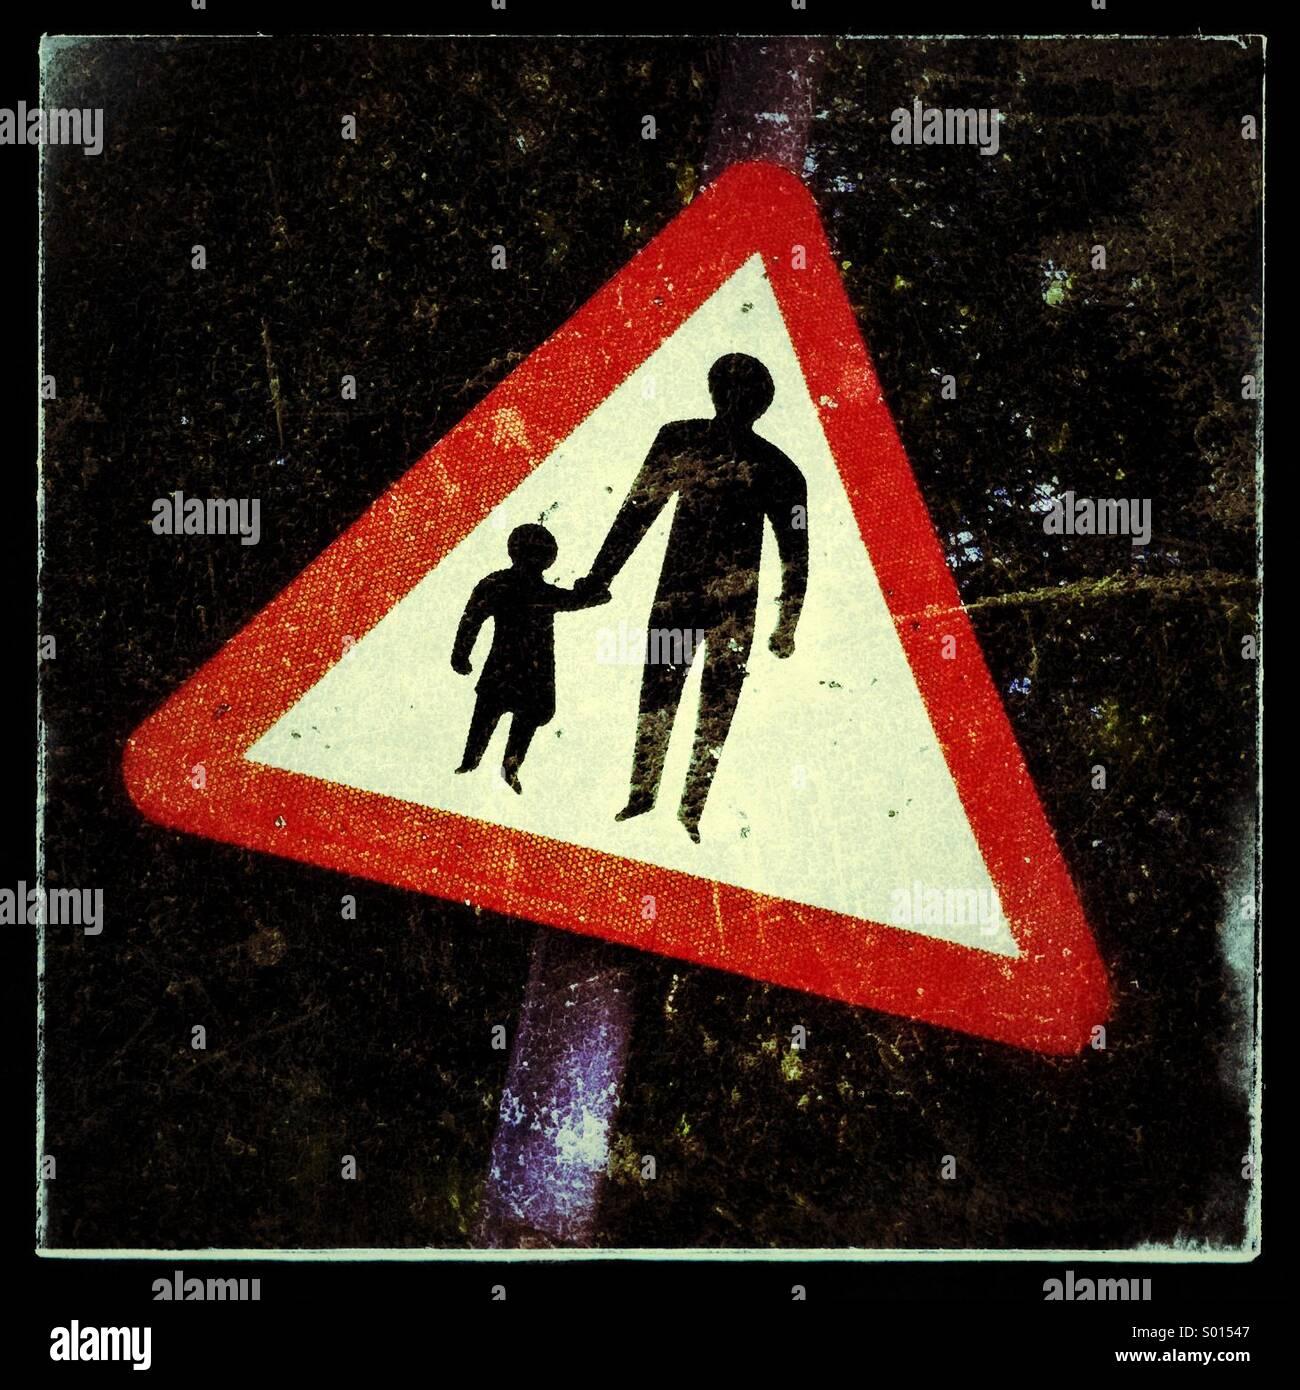 Children - Stock Image